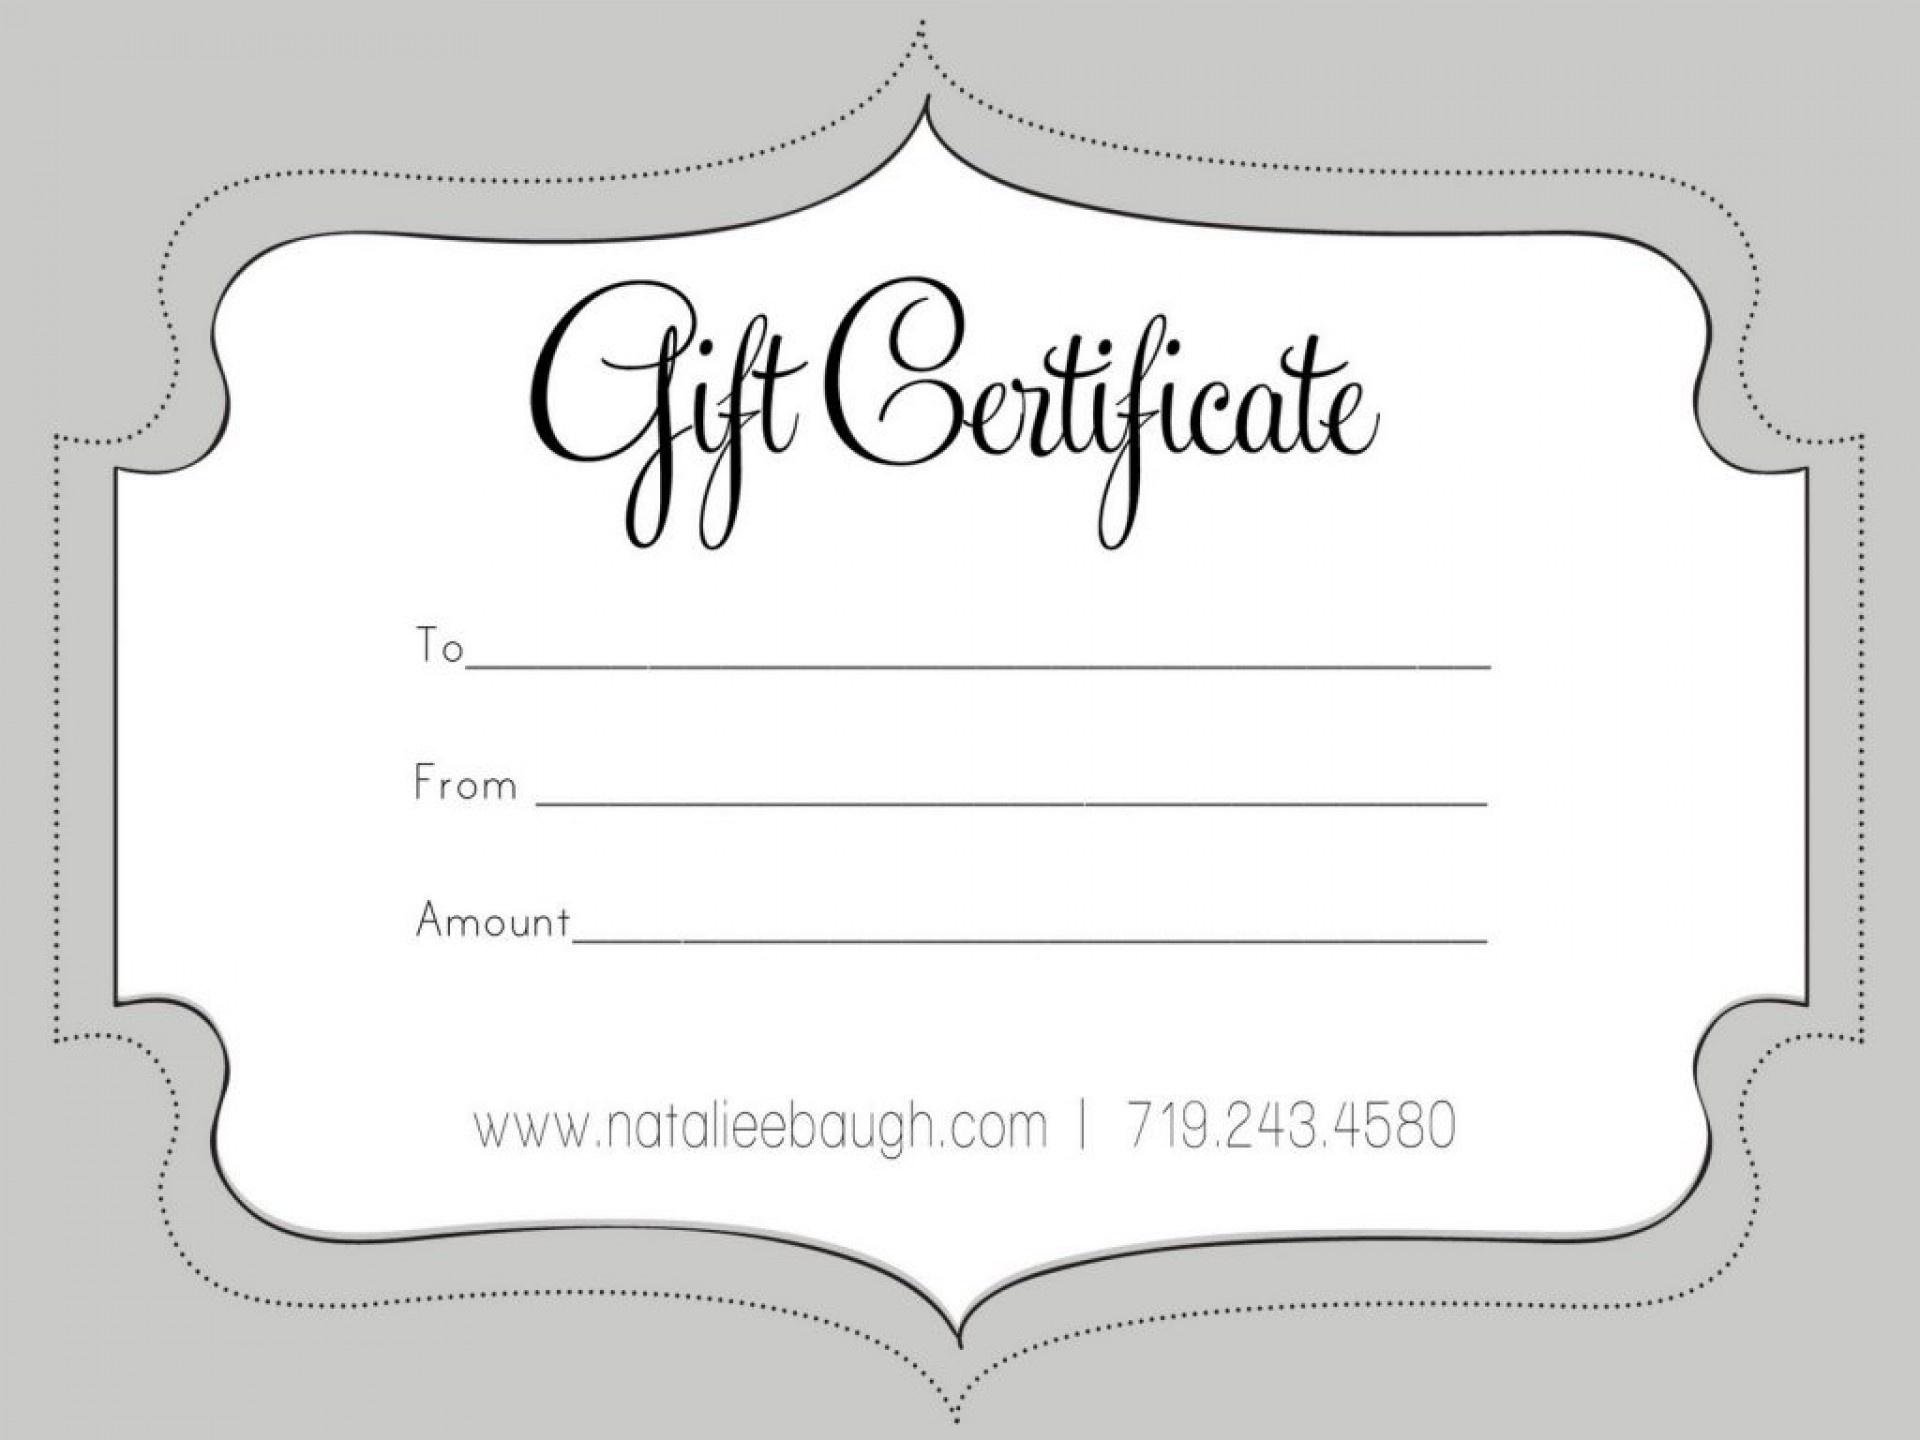 001 Salon Gift Certificate Template Sensational Ideas Beauty Free - Free Printable Pedicure Gift Certificate